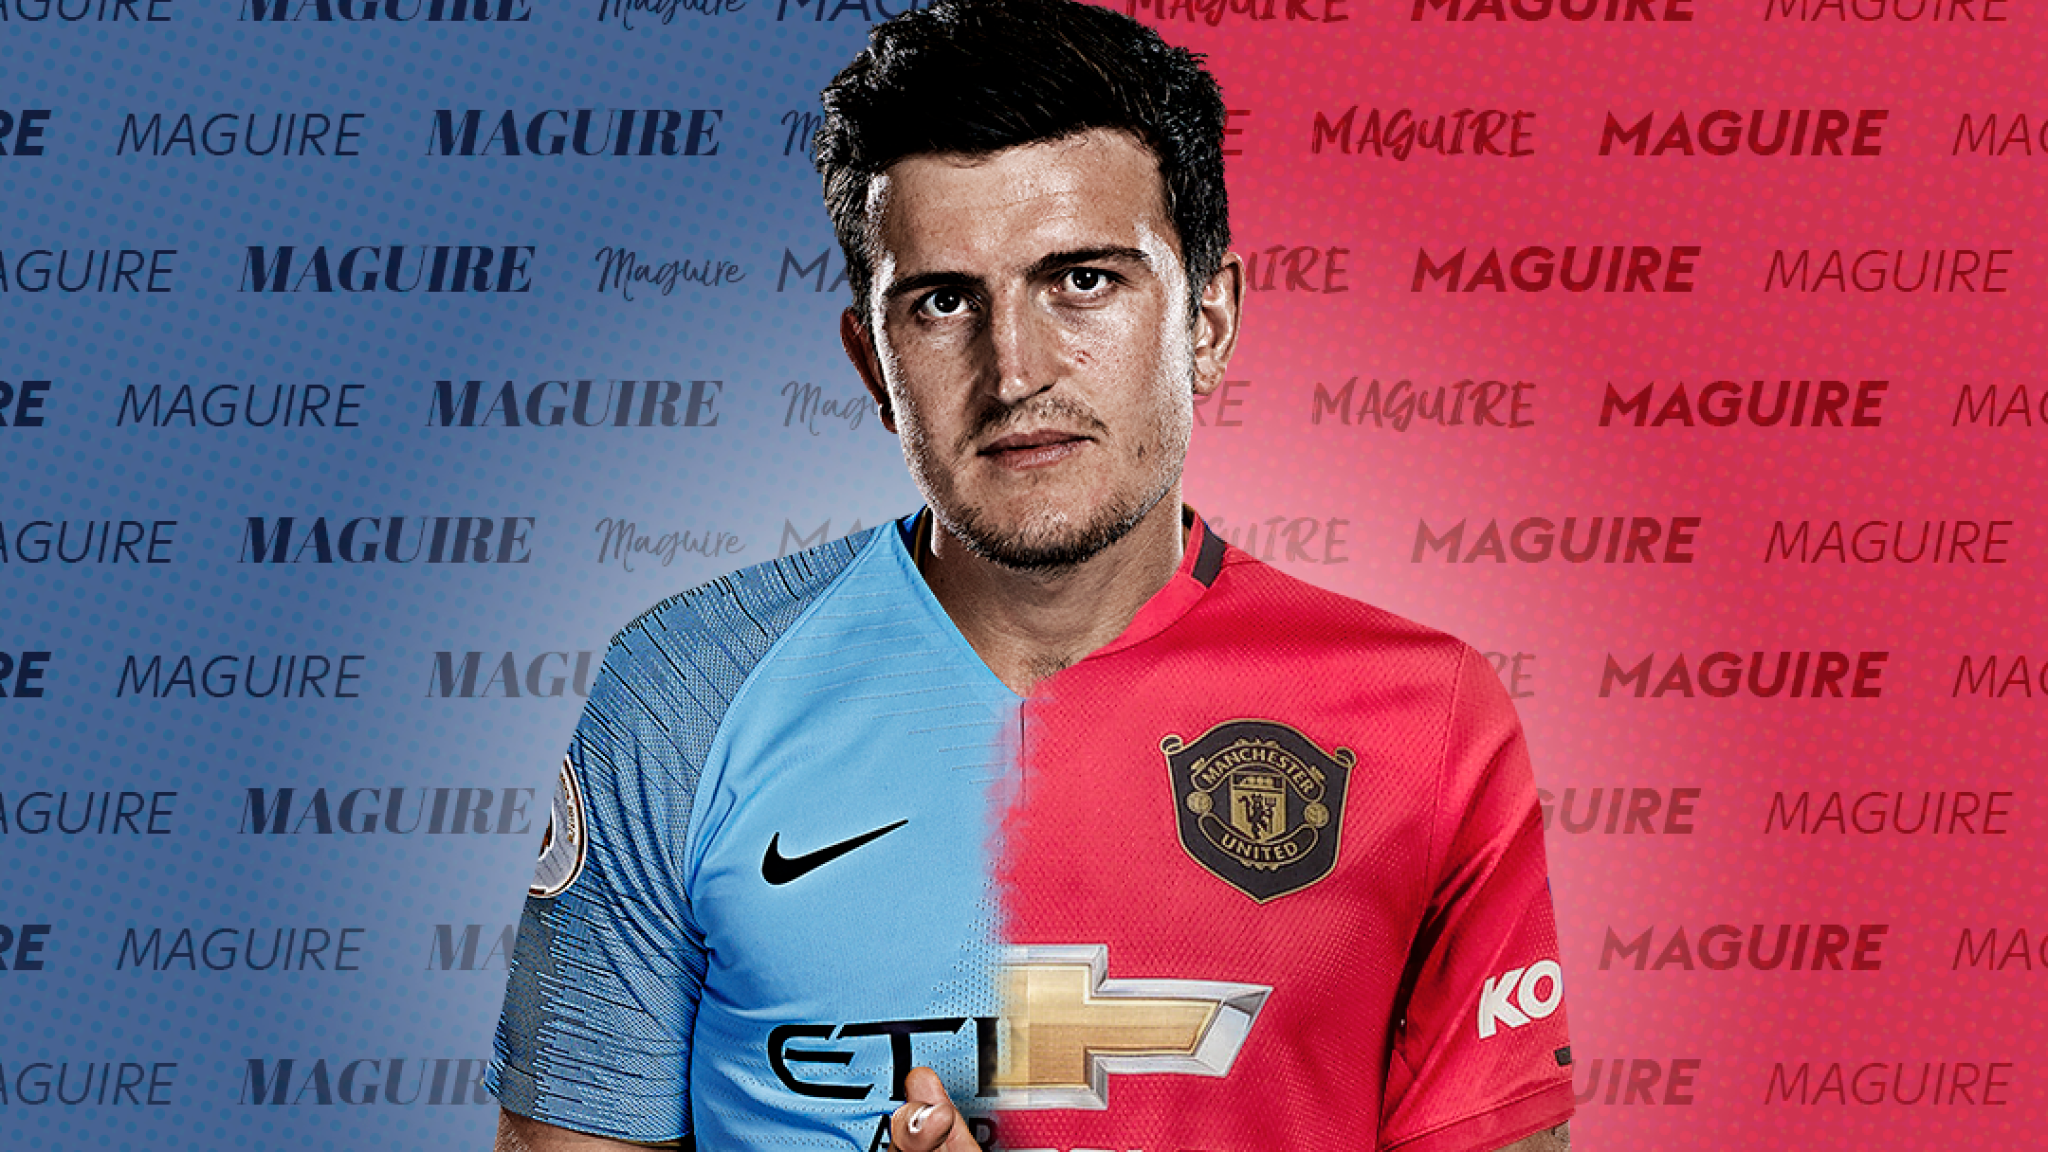 Photo of Fakta Mengenai Pemain Sepakbola Harry Maguire dan Manchester United Yang Tak Kunjung Melepas Harry Maguire